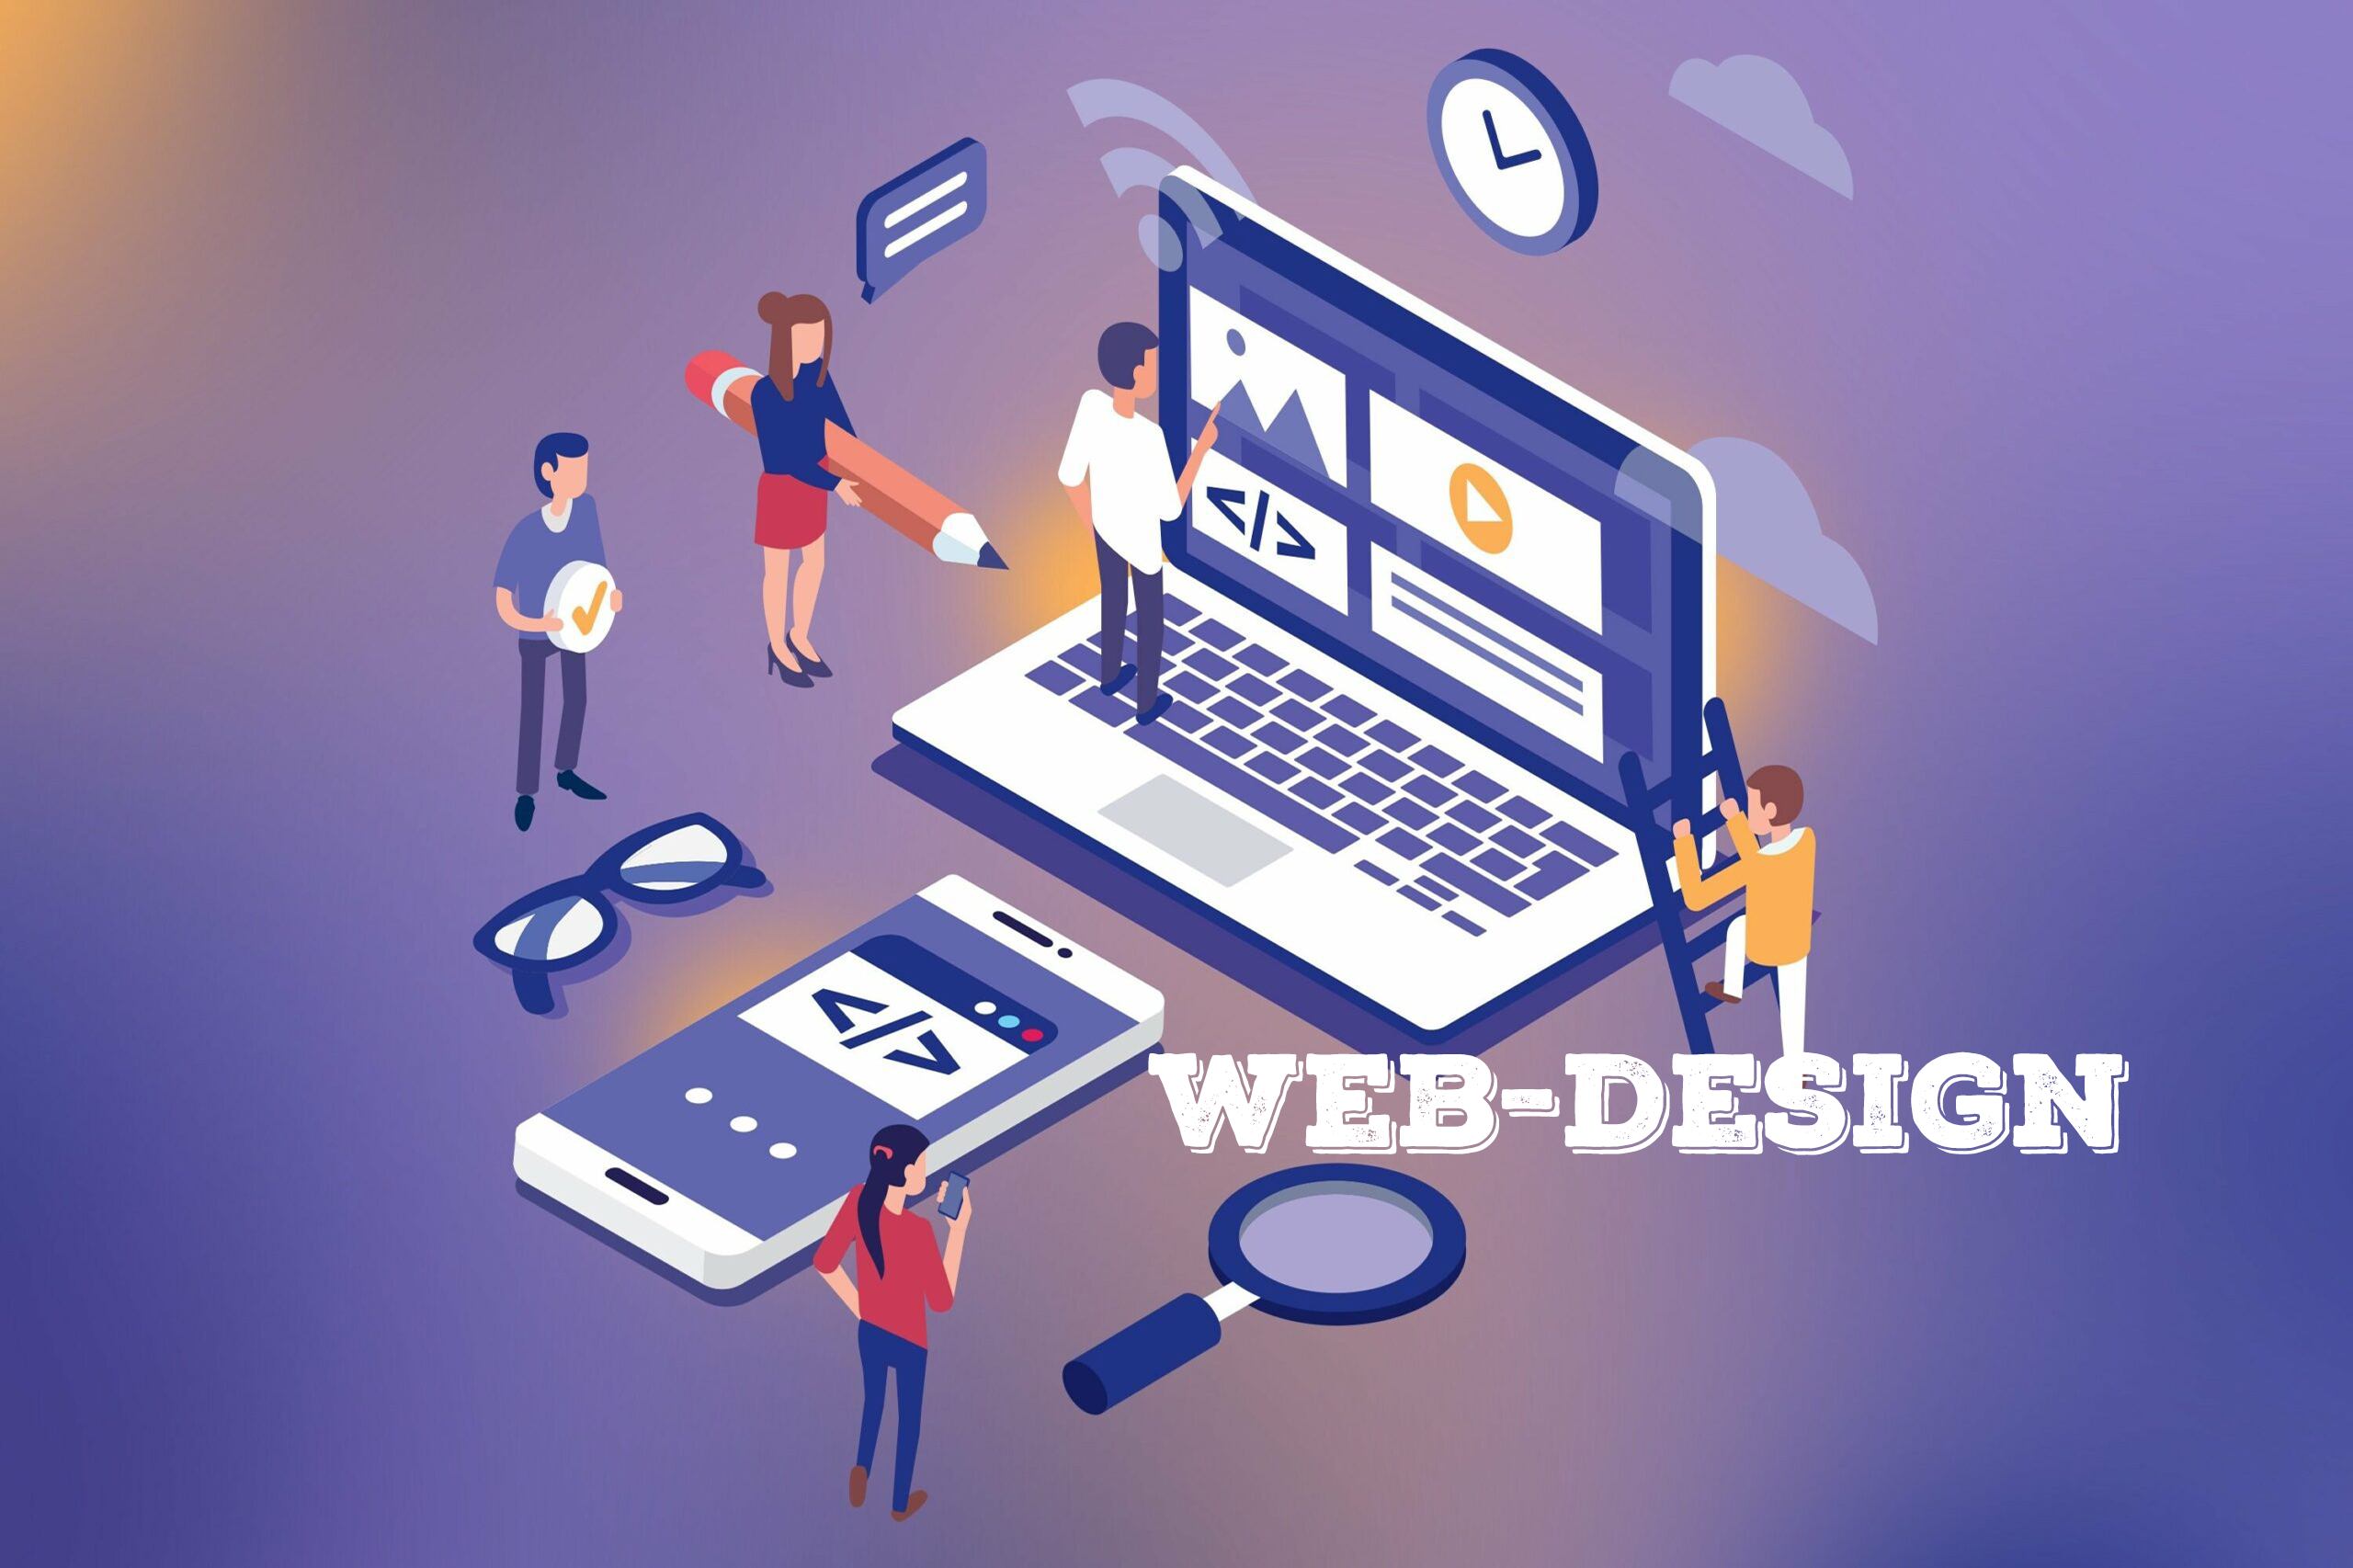 Web Design - Thiết Kế Web